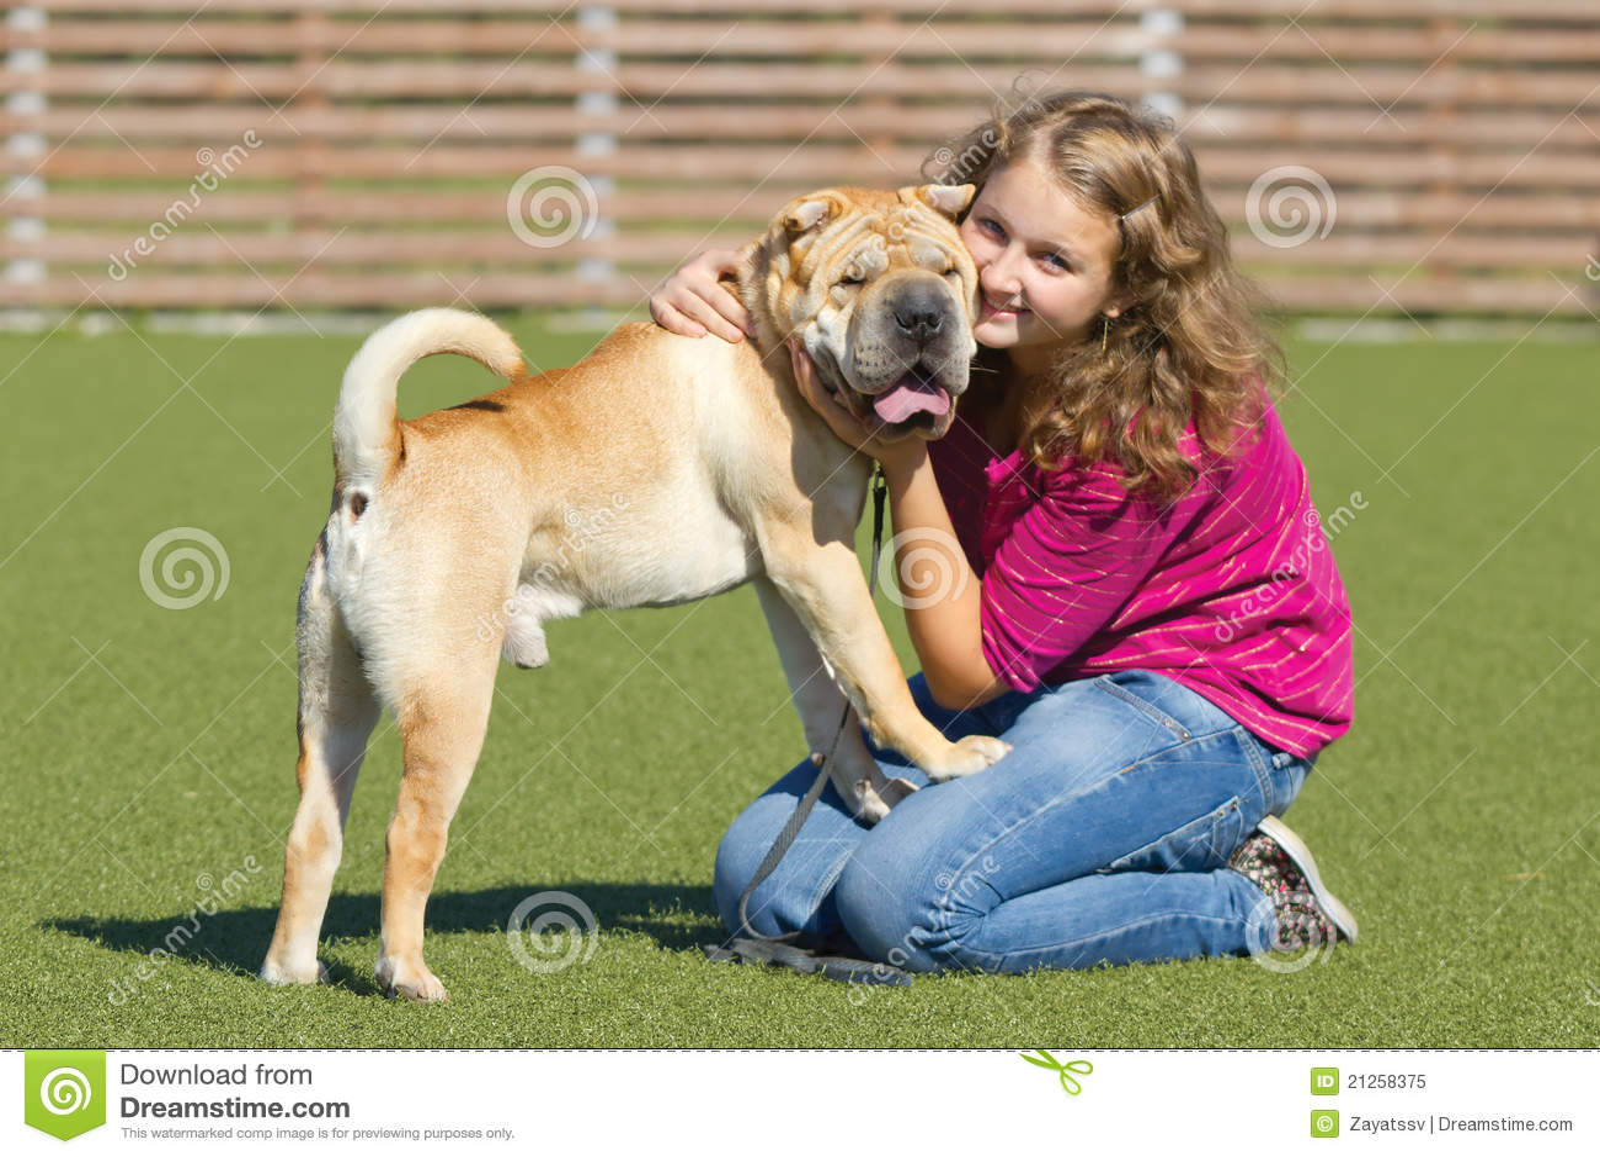 Field Of Dreams Dog Training